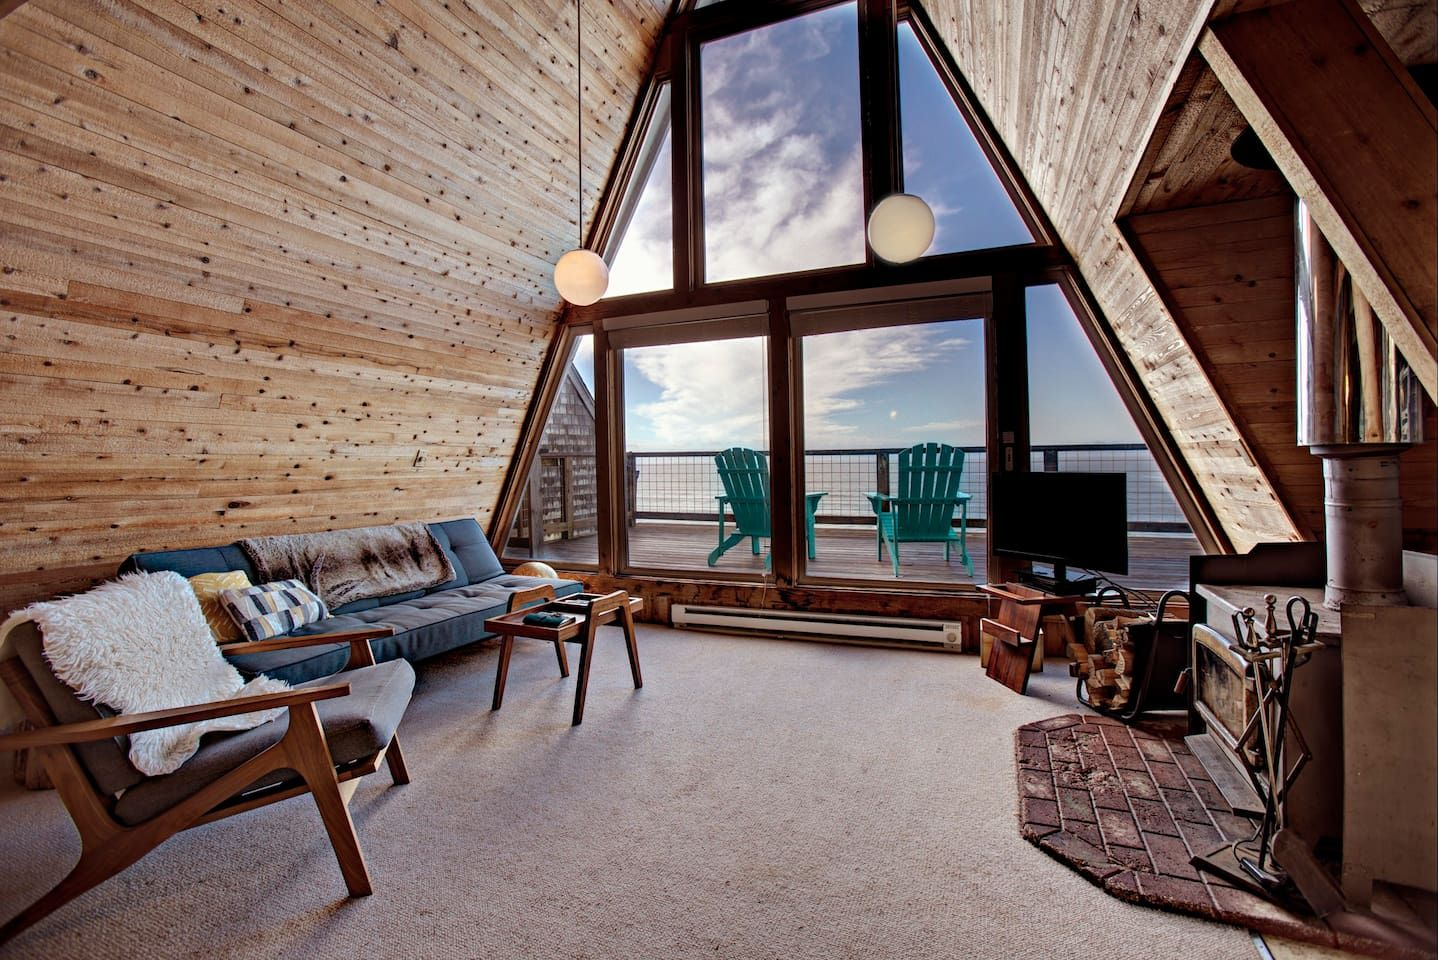 Oceanside A Frame Unit A Cottages For Rent In Oceanside A Frame Cabin Cabins And Cottages Historic Homes